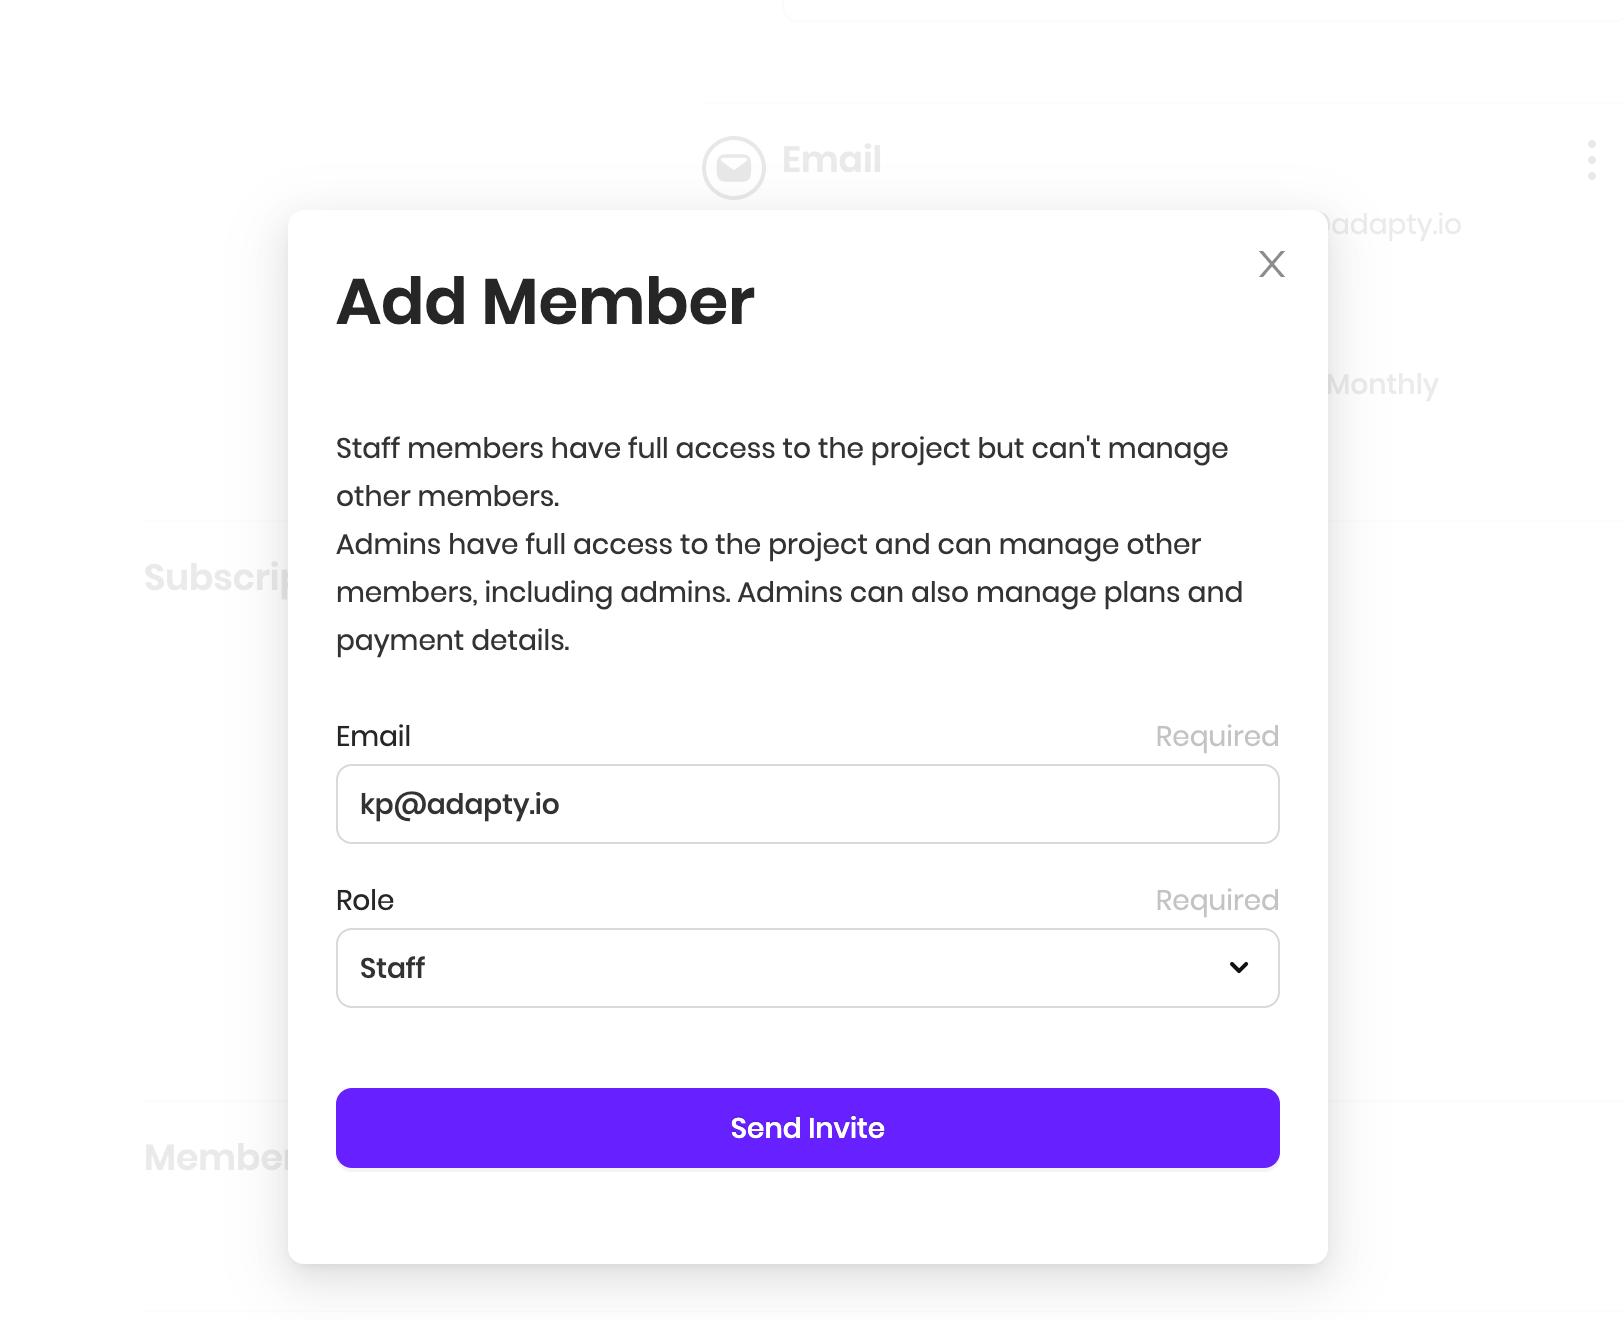 adding members to adapty